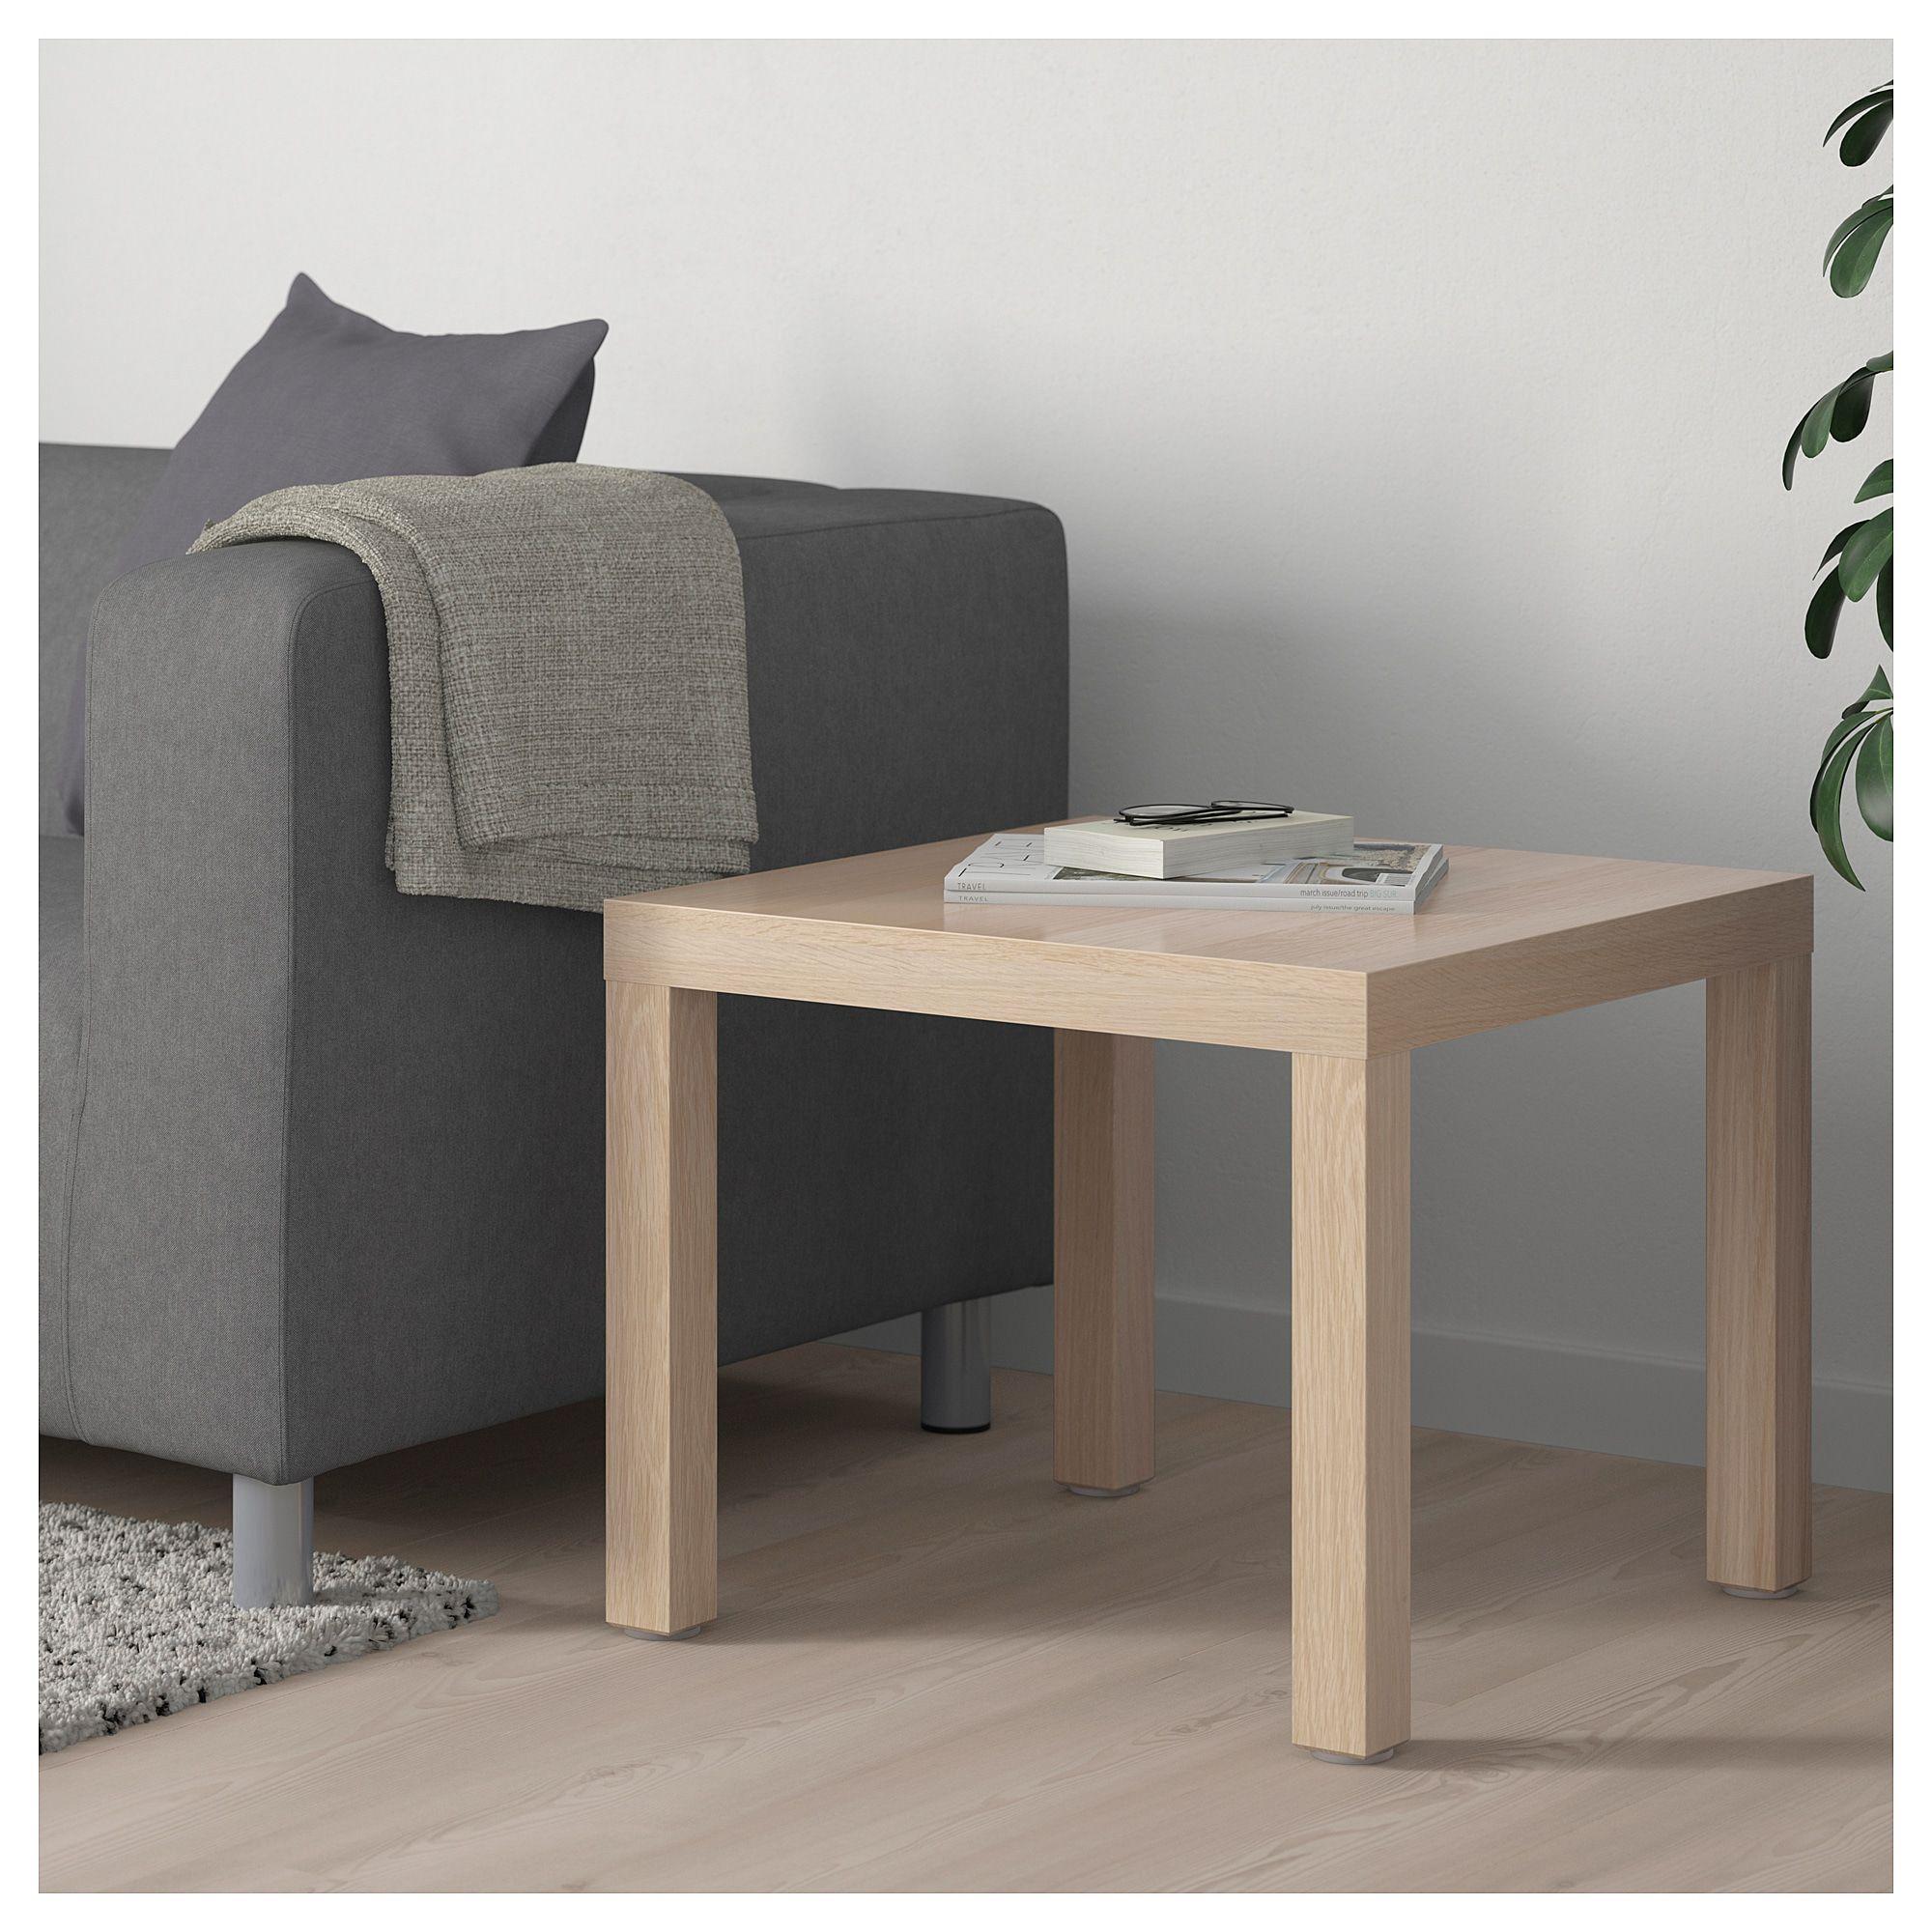 Https Www Ikea Com Us En Catalog Products 20011413 70319028 Ikea Lack Side Table White Side Tables Ikea Lack Coffee Table